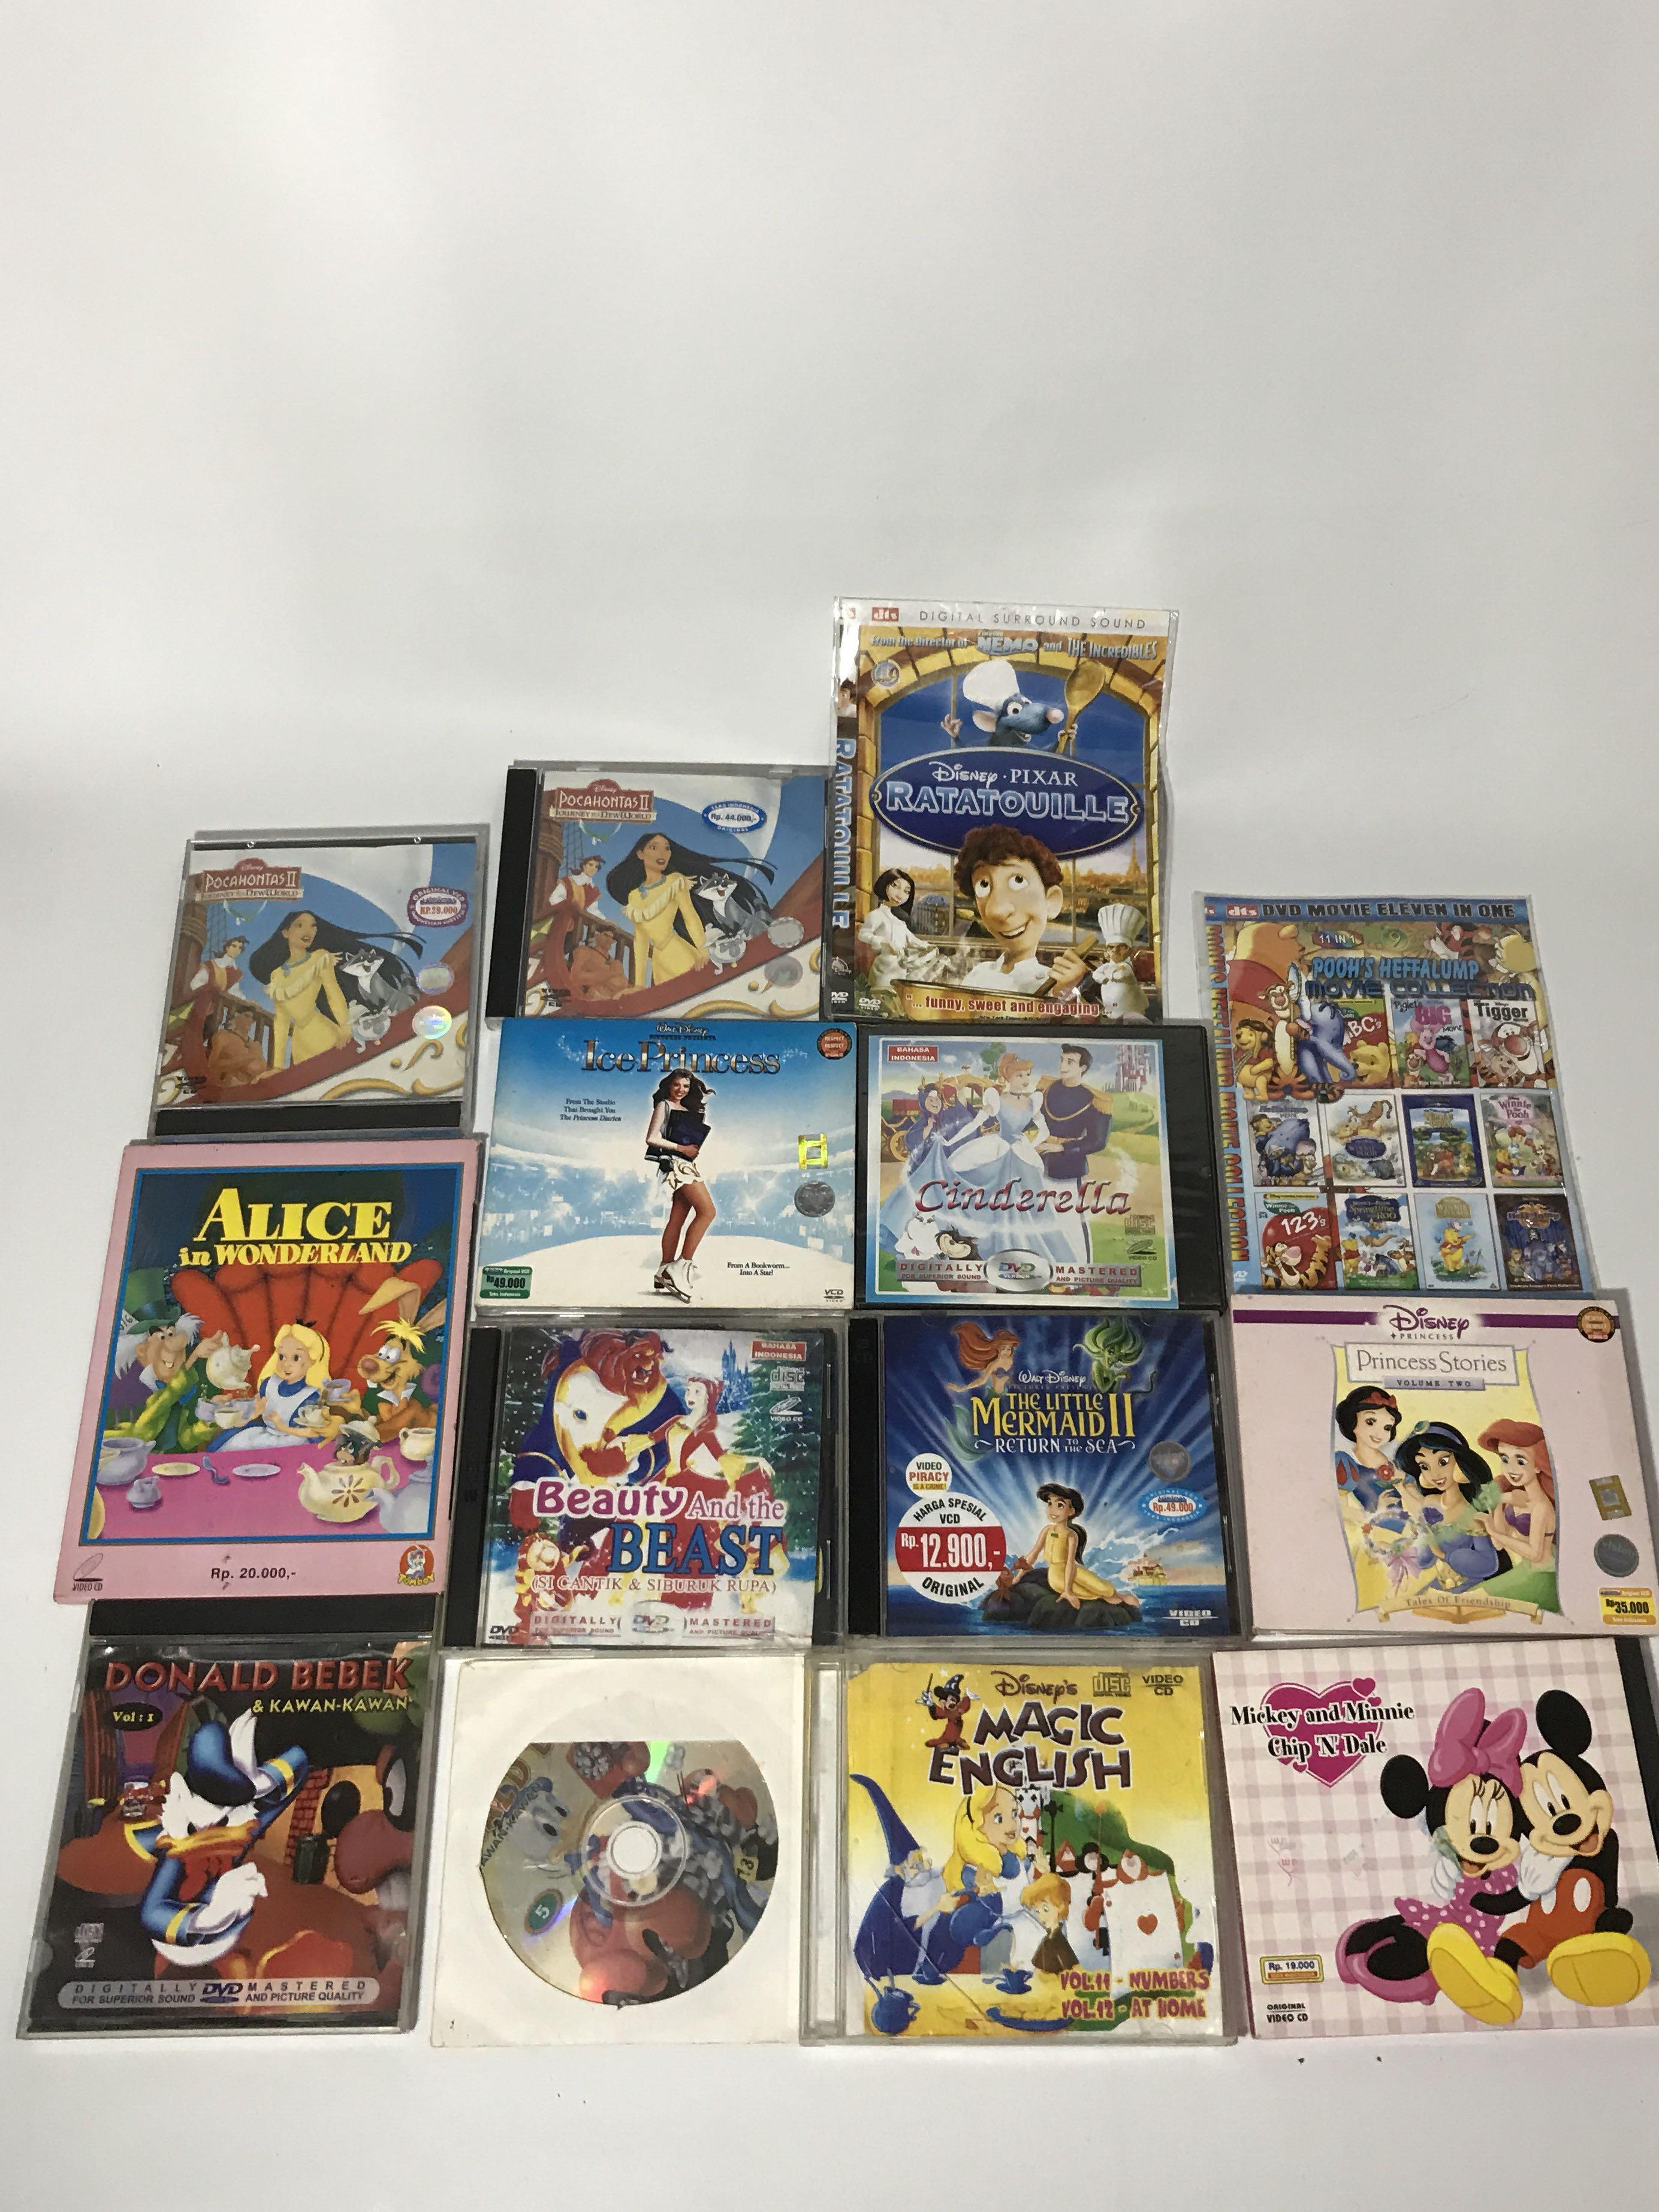 Disney dvd bundled up set